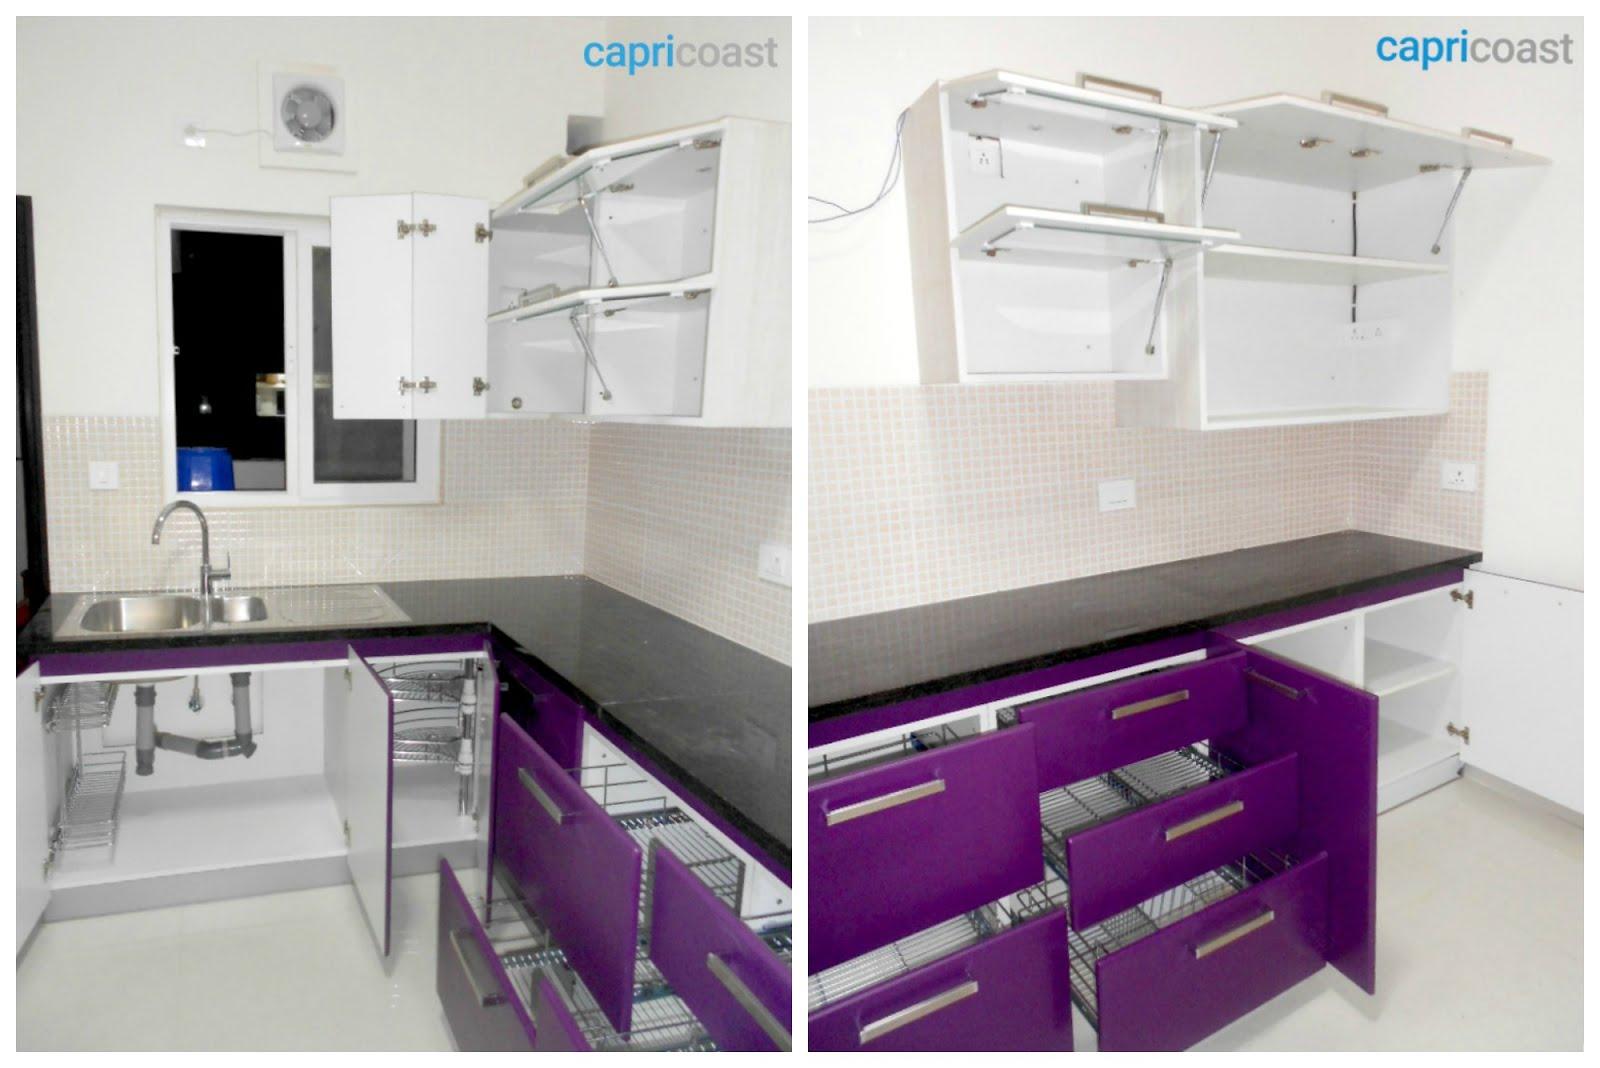 Design Decor & Disha | An Indian Design & Decor Blog: CapriCoast ...